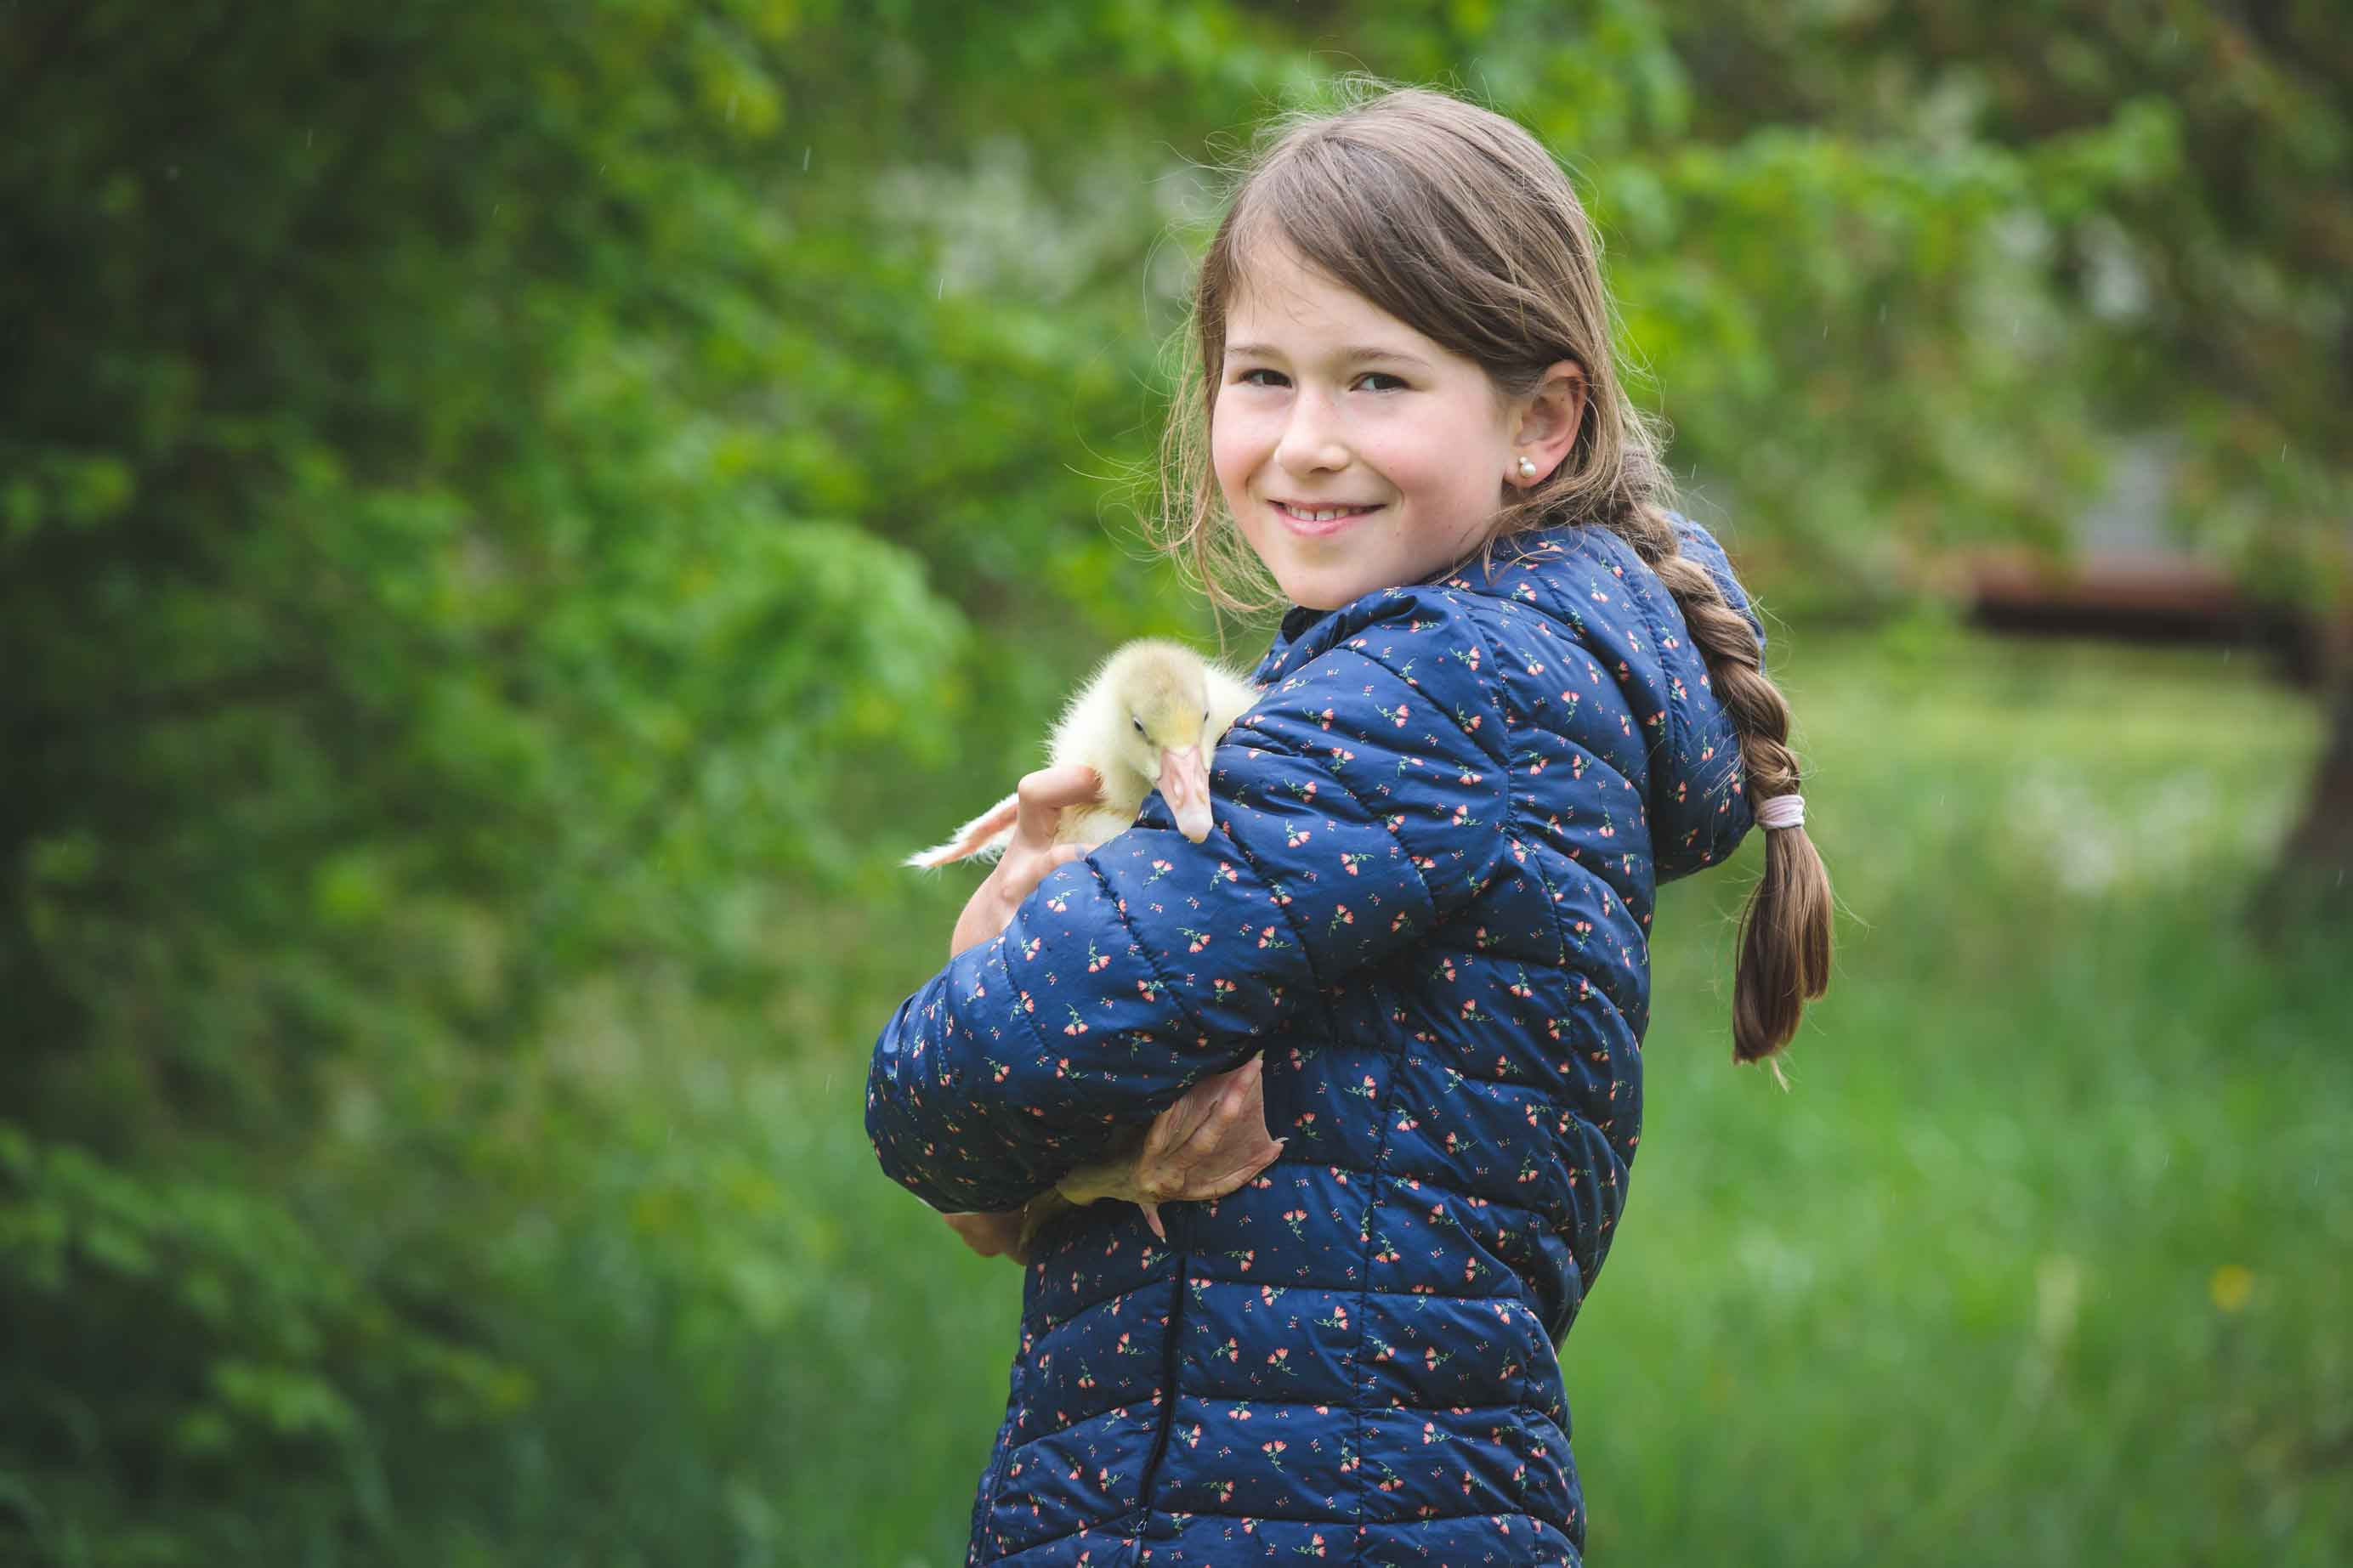 Kinderportraits mit Gänseküken IMG 0682w